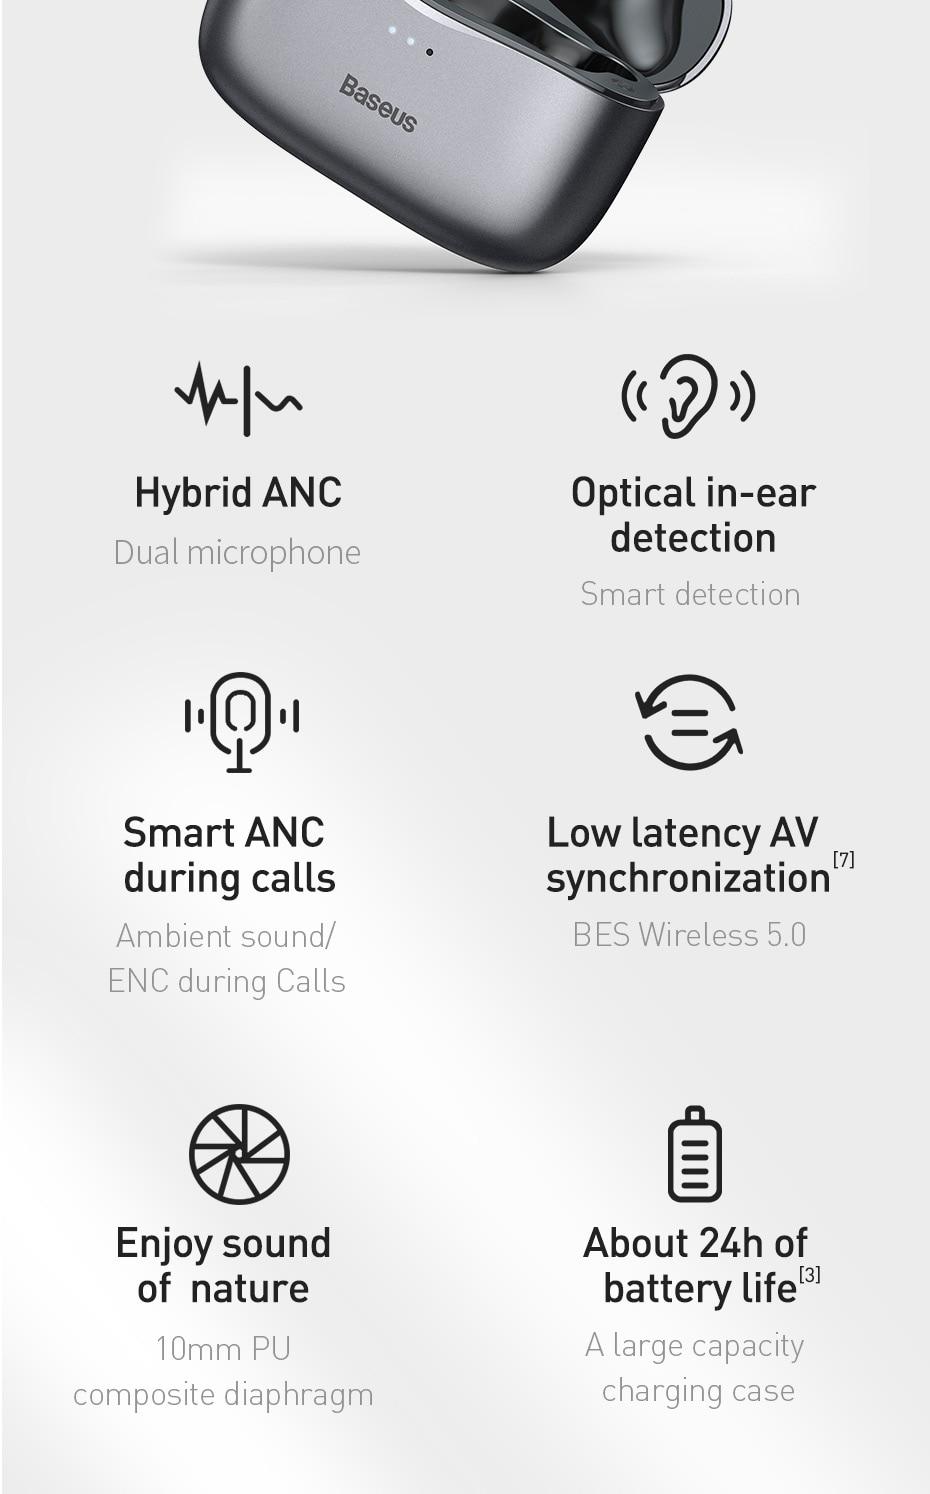 Baseus S2 ANC Earphone Active Noise Cancelling Hi-Fi Audio Gaming TWS Earphone NGS2-03 6